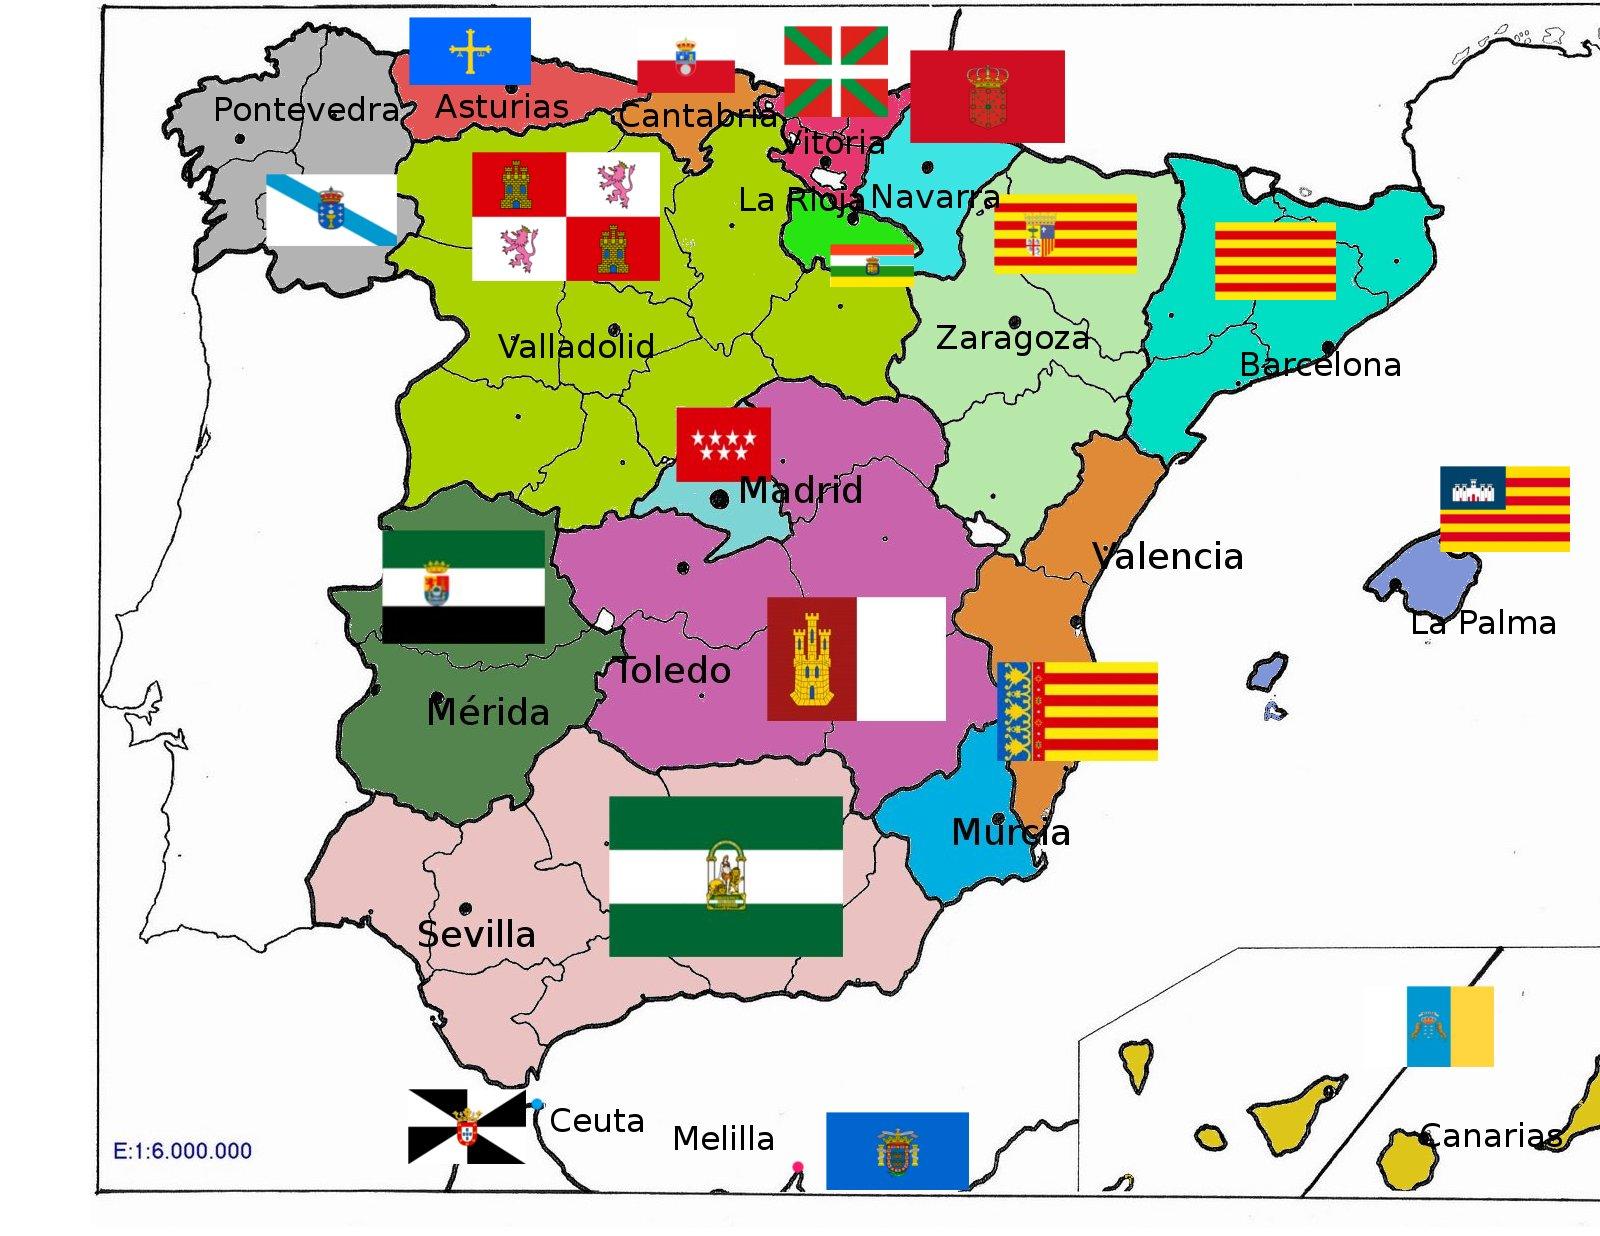 Mapa De España Provincias Y Comunidades.Mapas De Espana Para Descargar E Imprimir Completamente